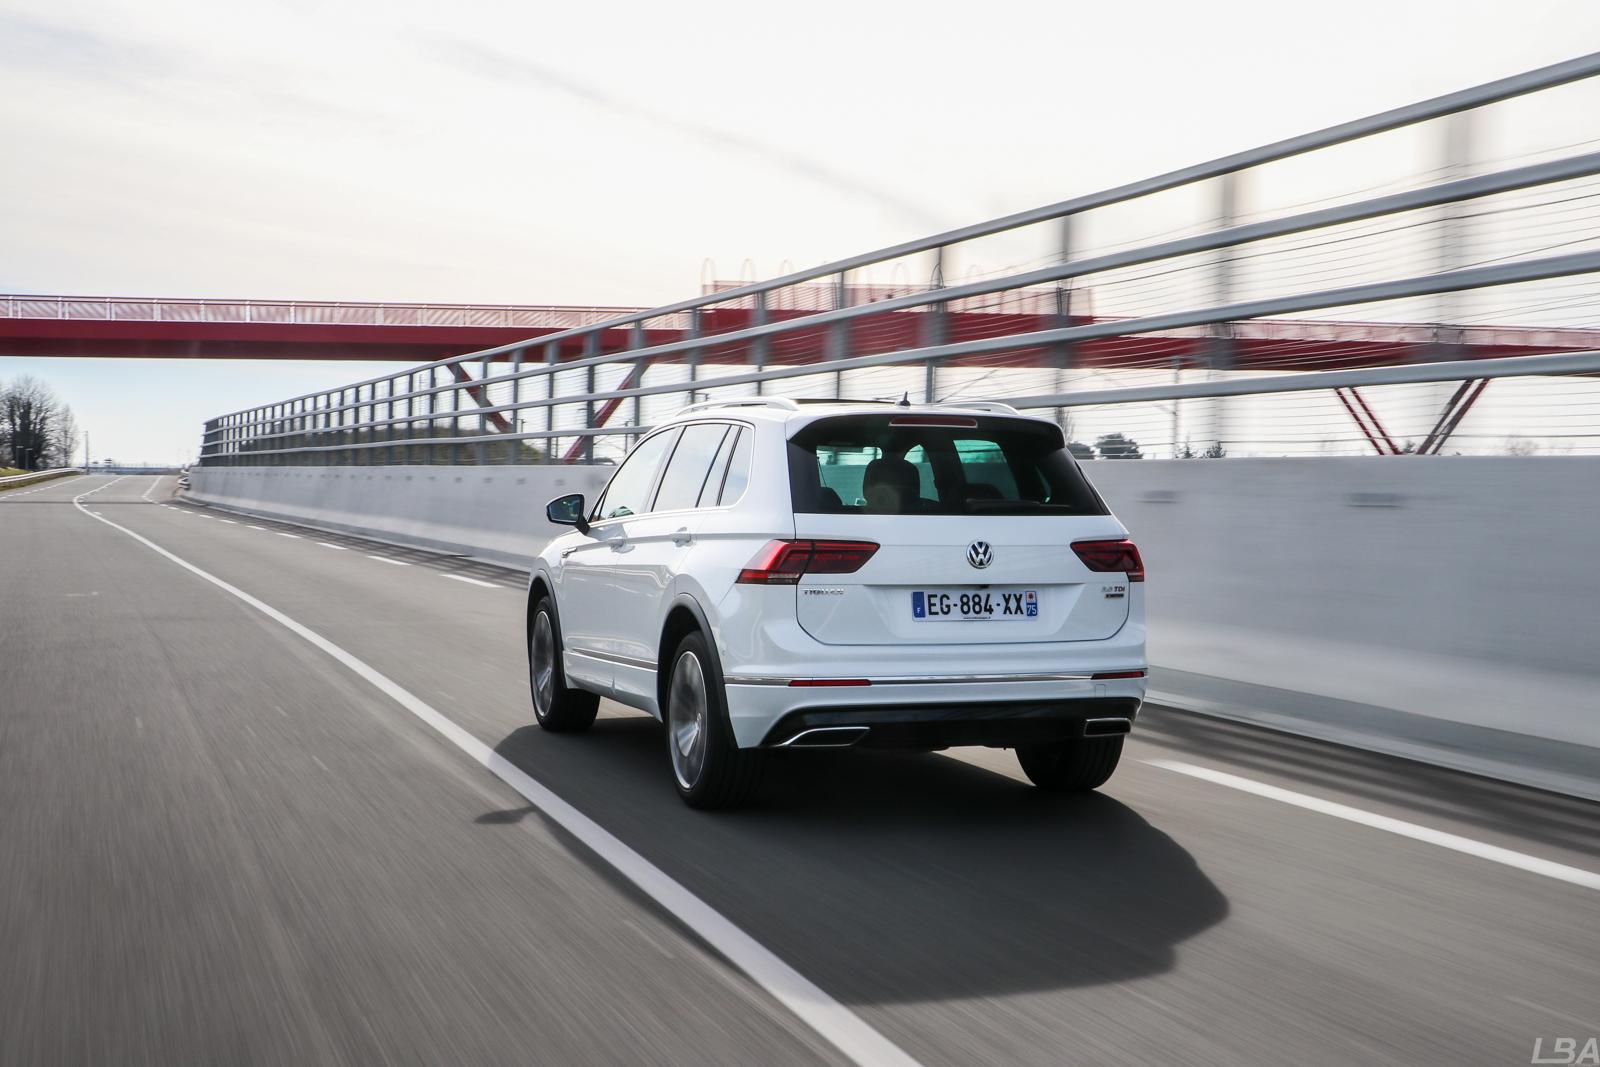 VW Tiguan RLine